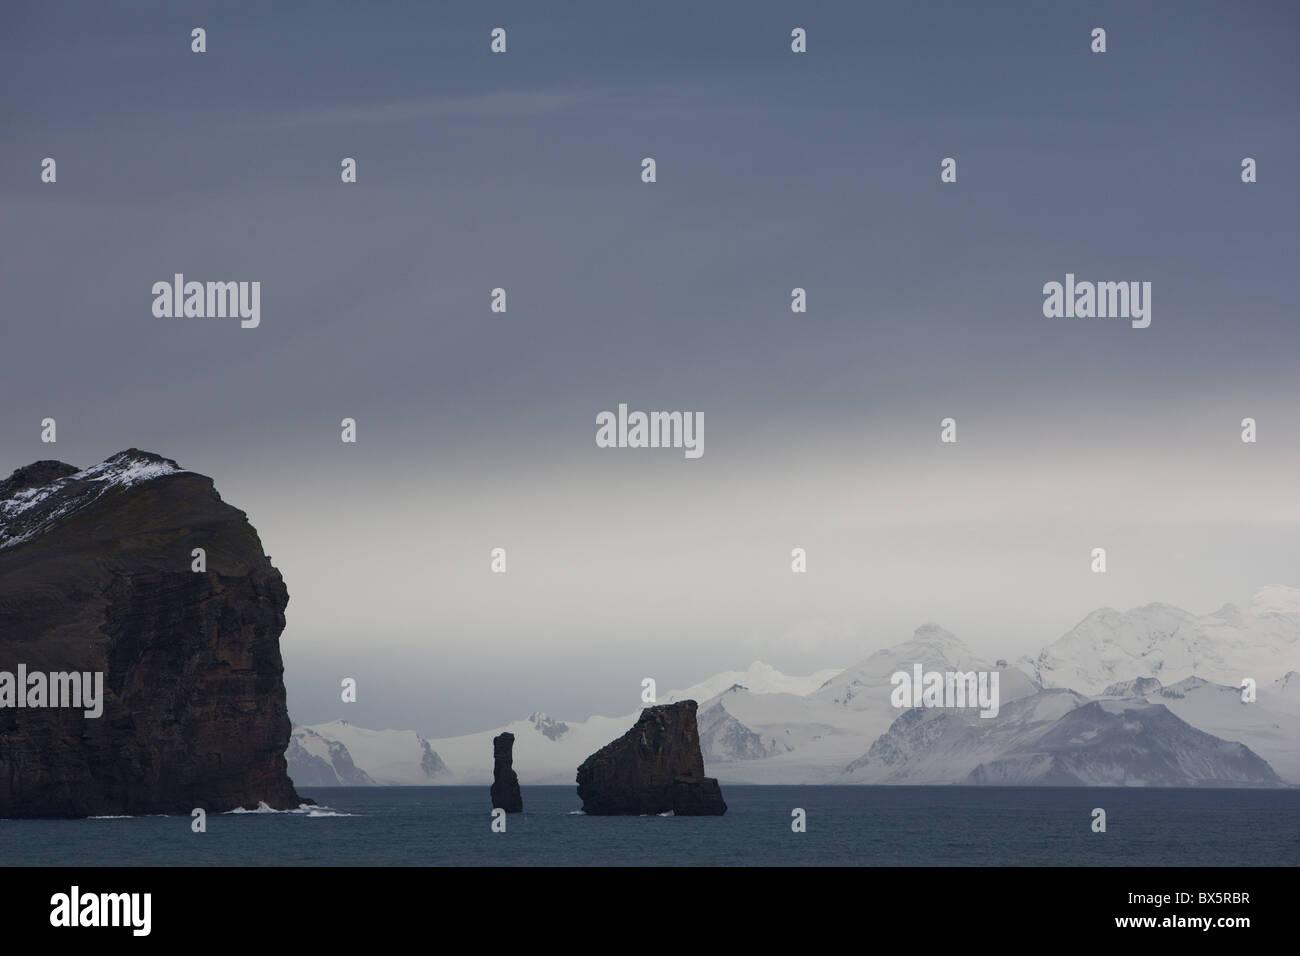 Deception Island, South Shetlands, Antarctic, Polar Regions - Stock Image